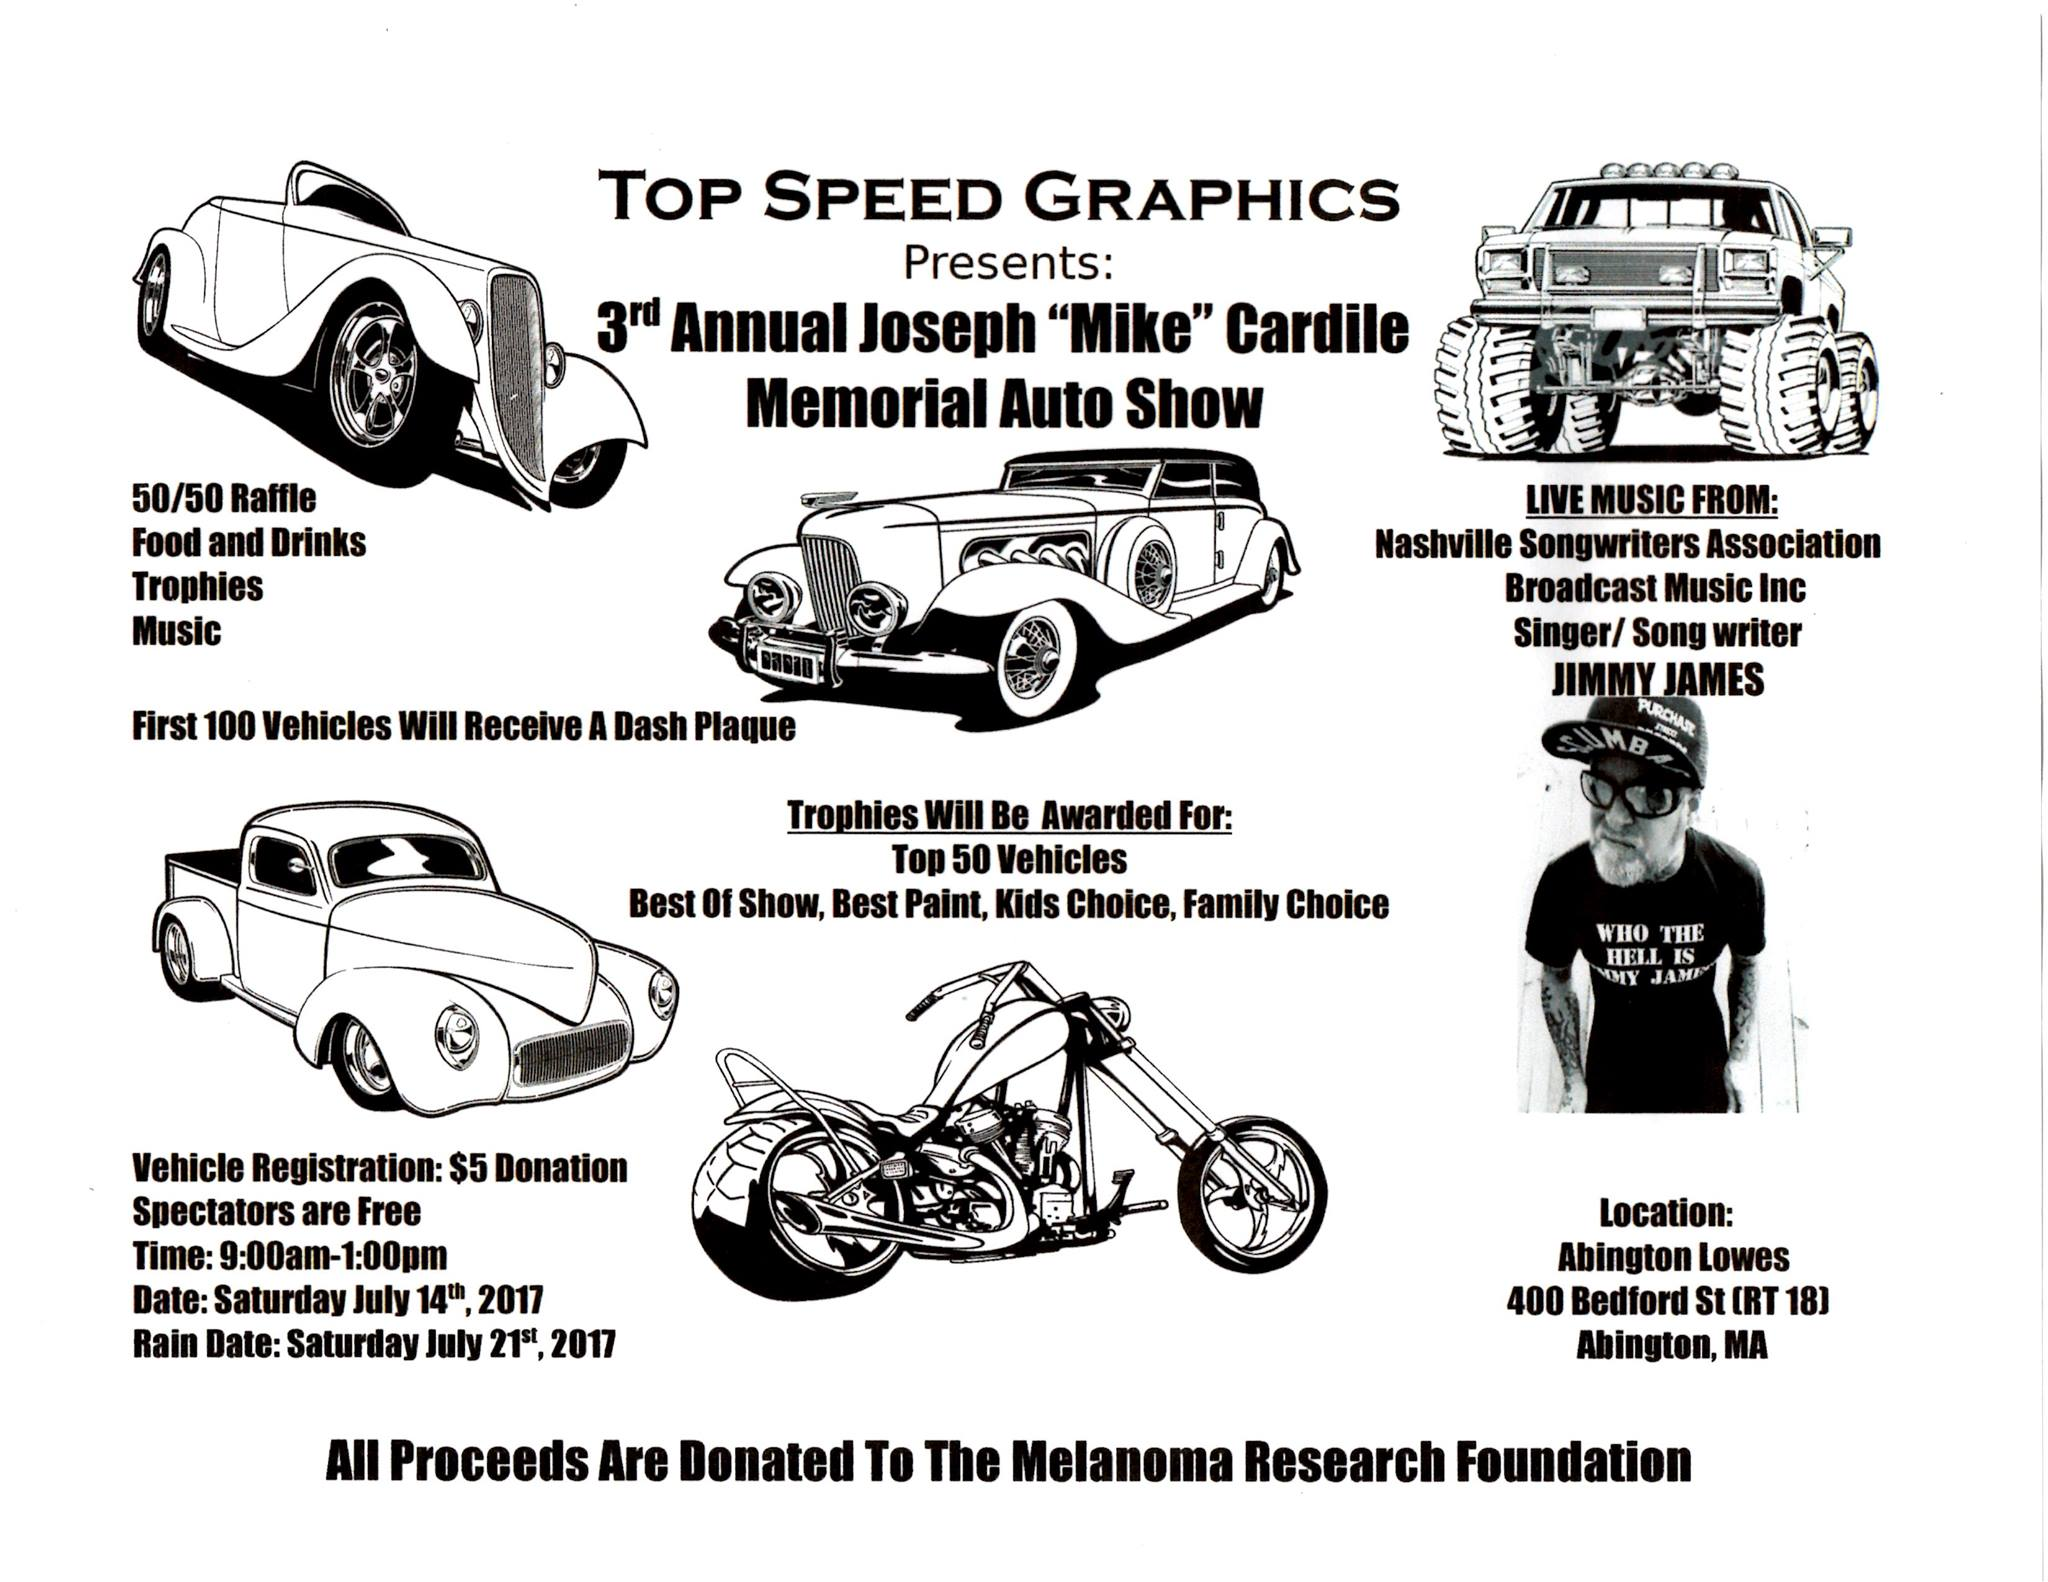 MA Abington Annual Joseph Mike Cardile Memorial Auto Show - Bedford car show 2018